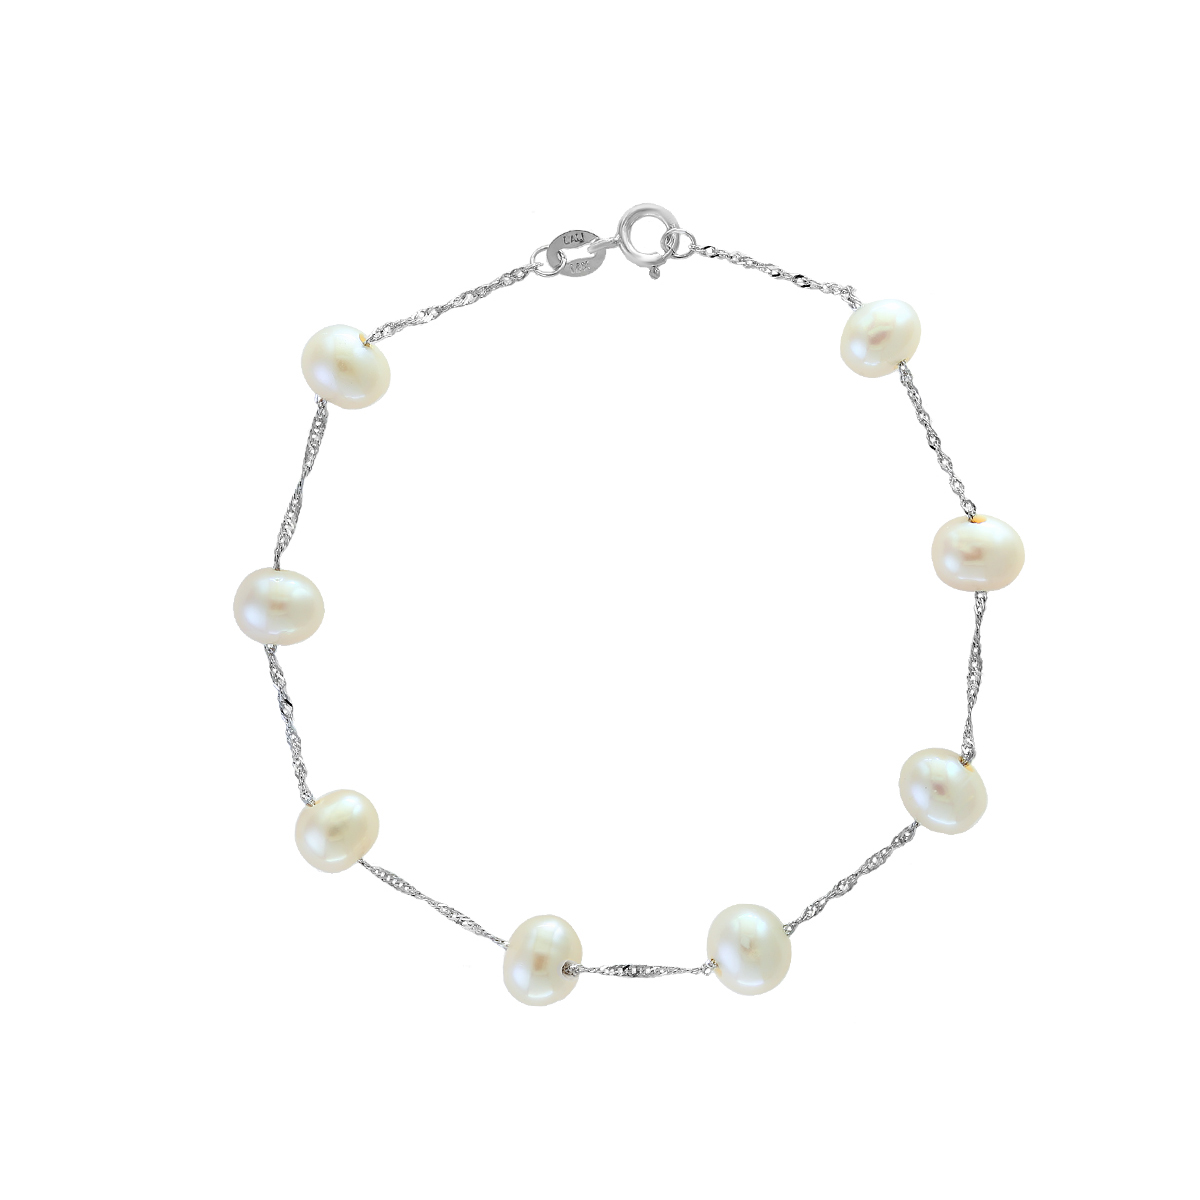 14 Karat White Gold Freshwater Cultured Pearl Bracelet